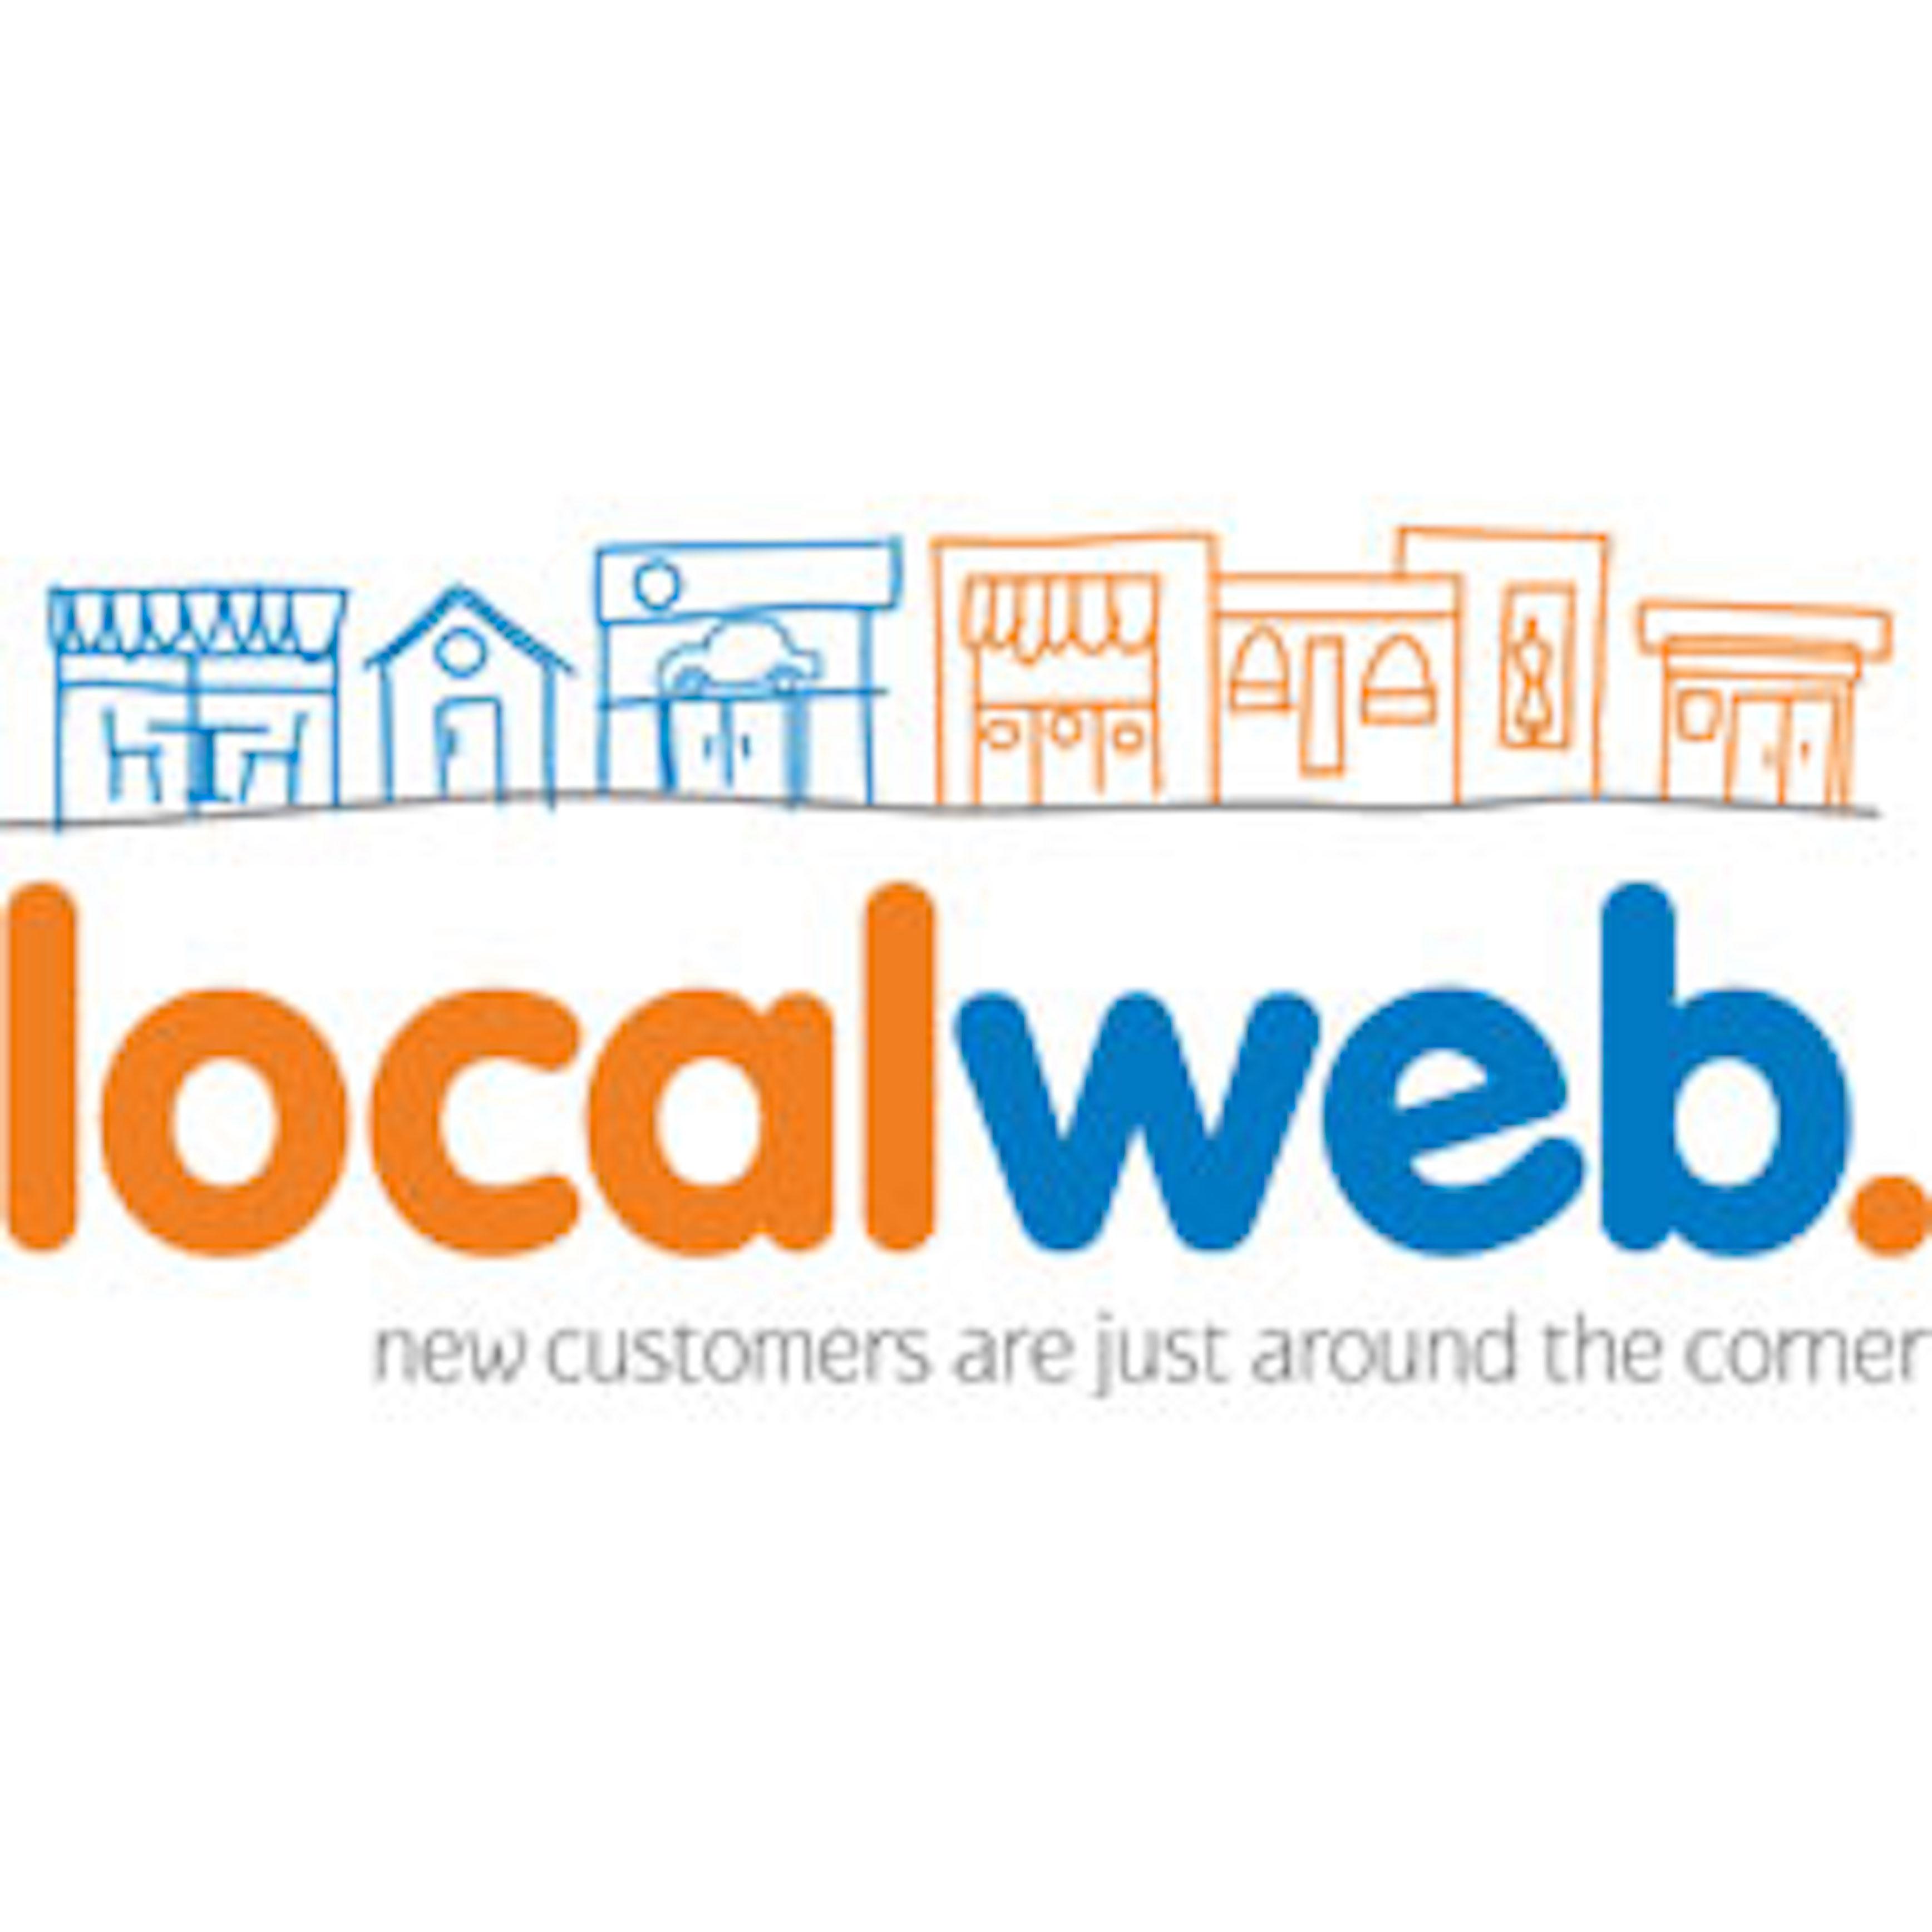 Local Web Advertising